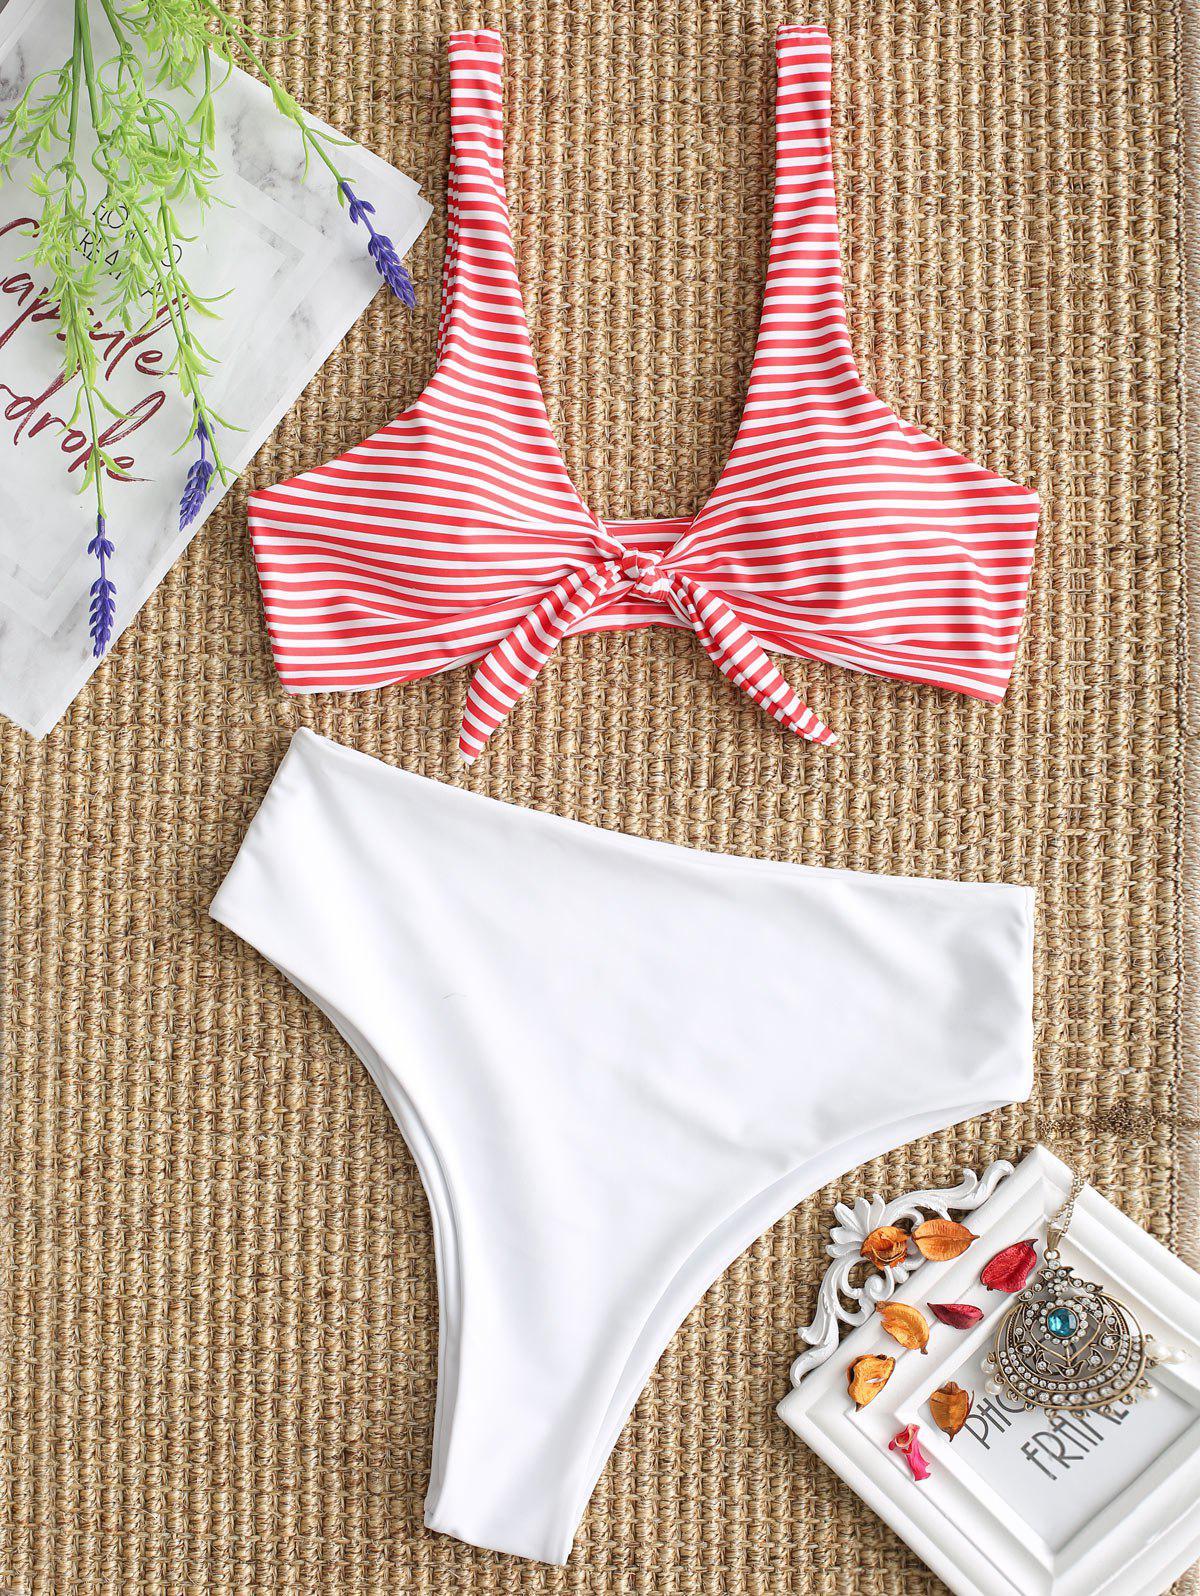 Knotted Striped Bikini